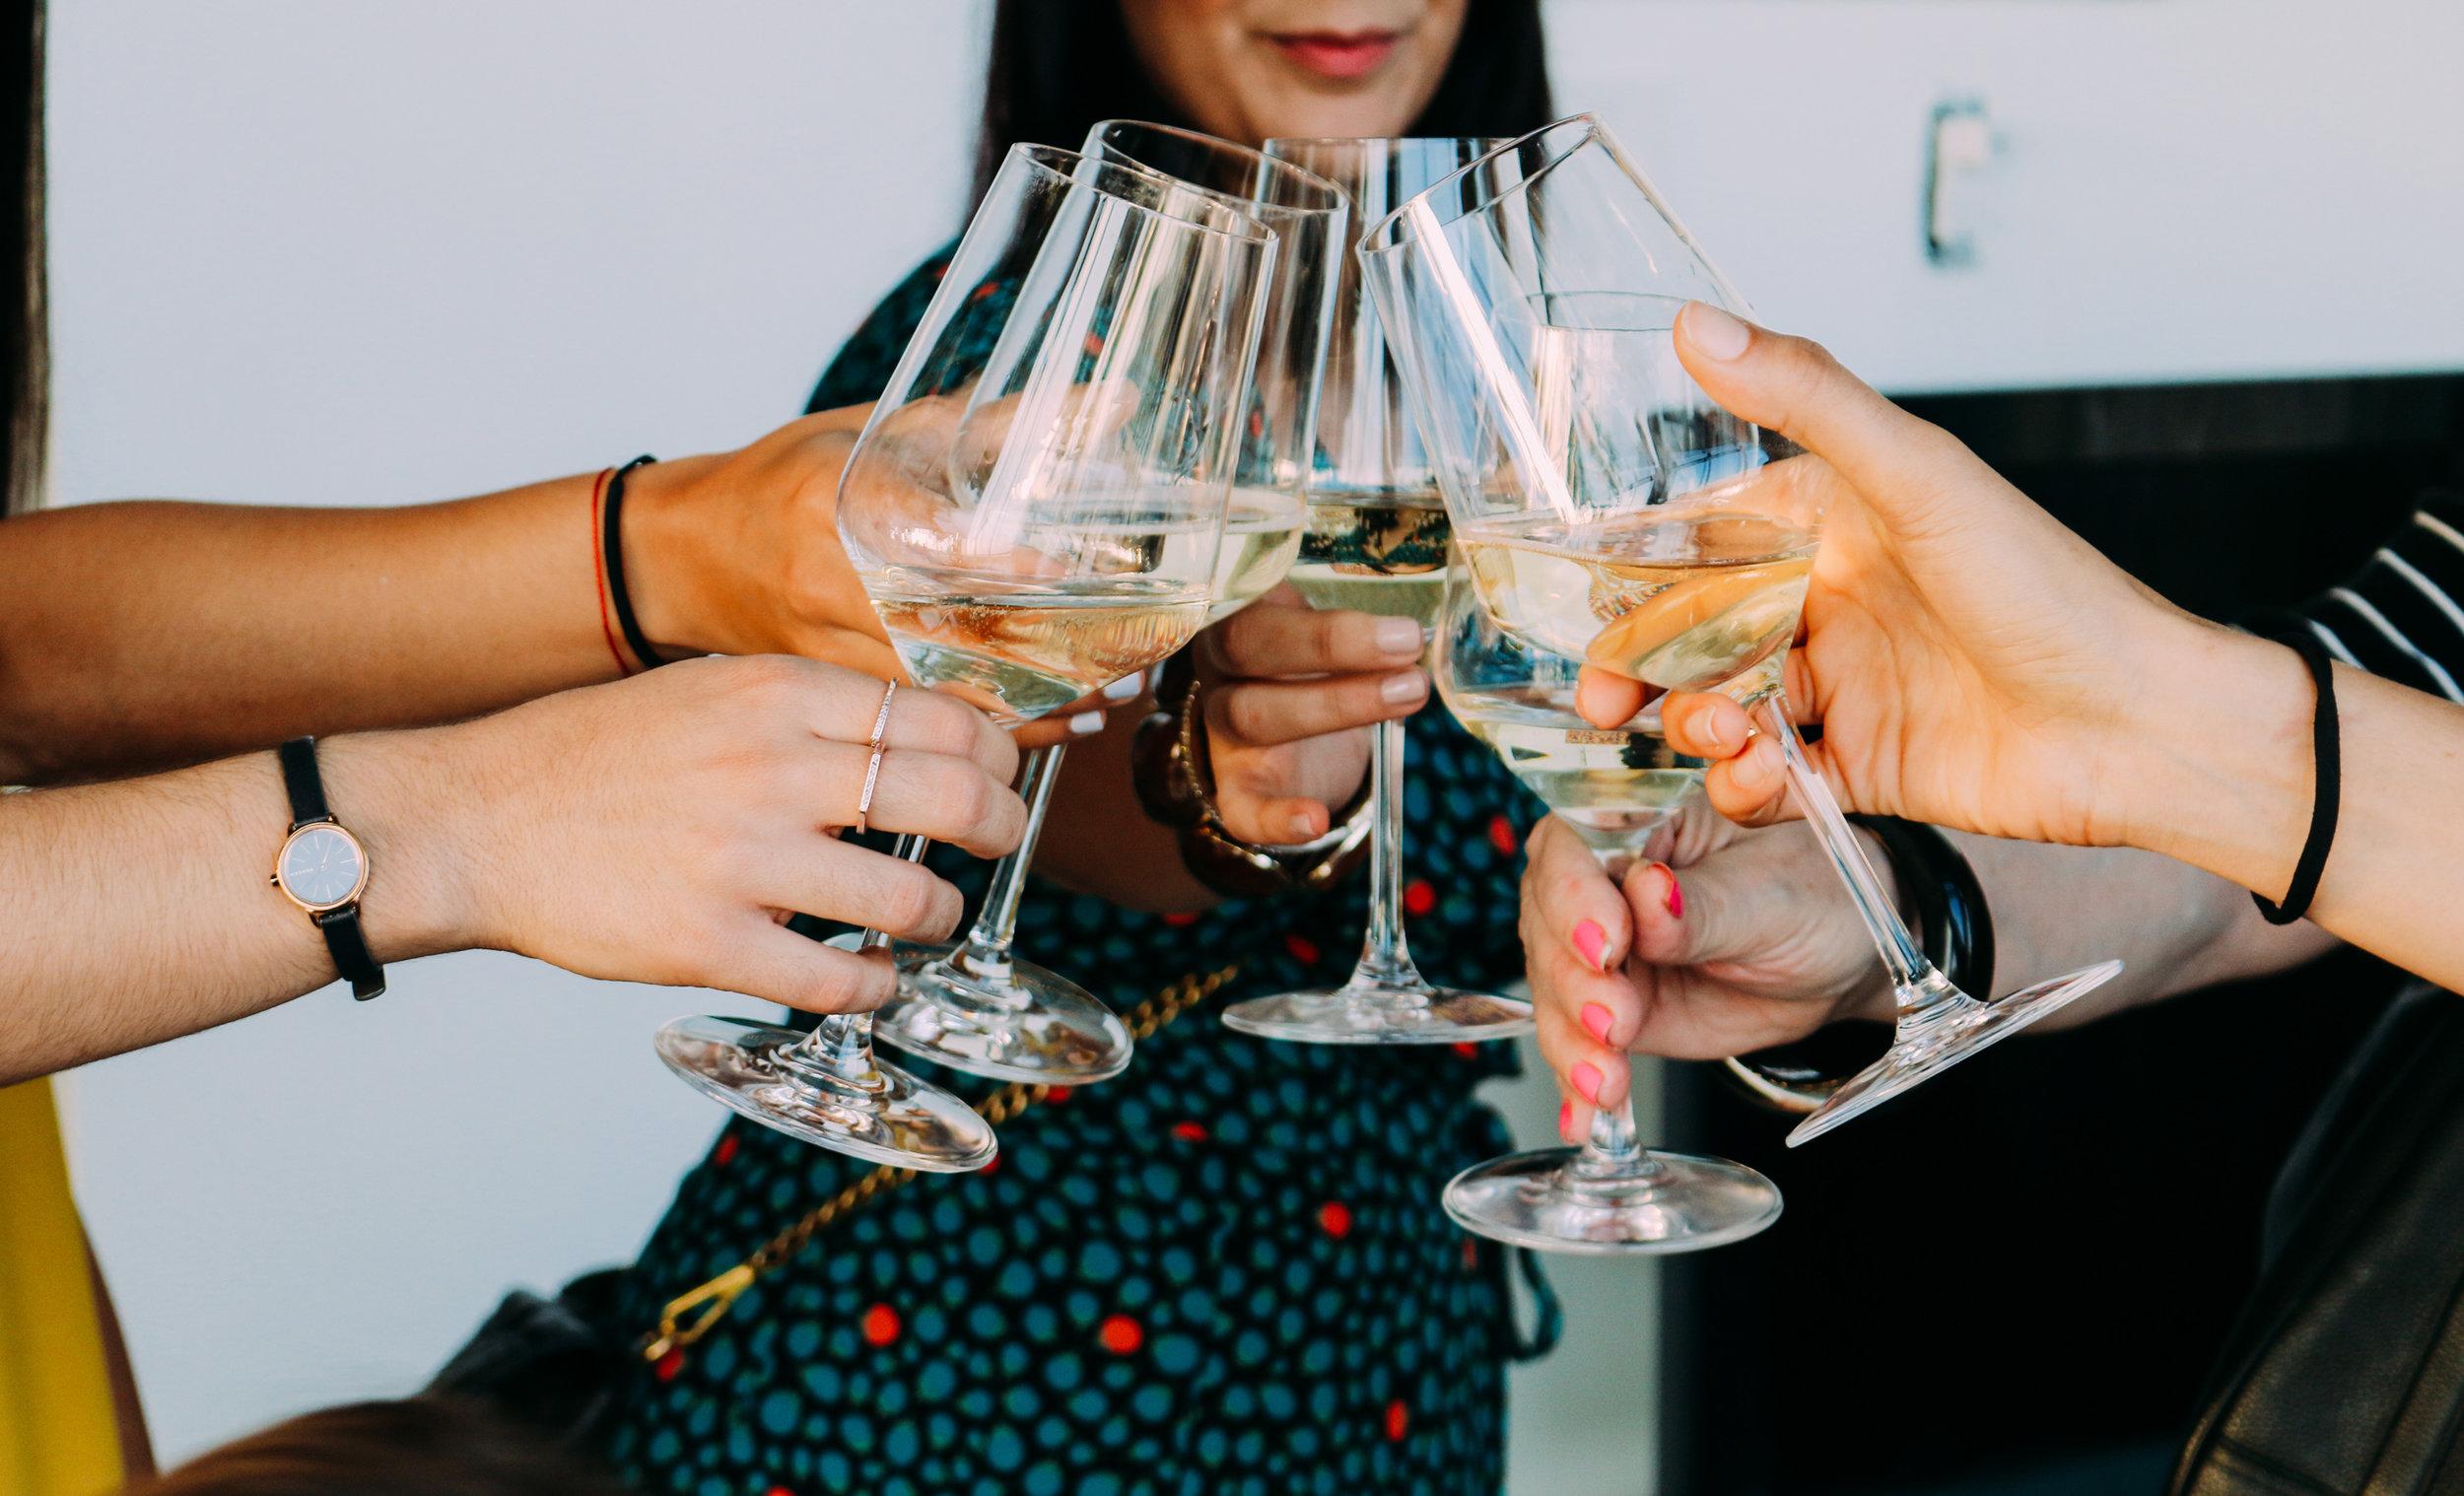 Women Who Wine Uncorked Conversations-Miami Wine Events-Wine Tasting Miami-19.jpg